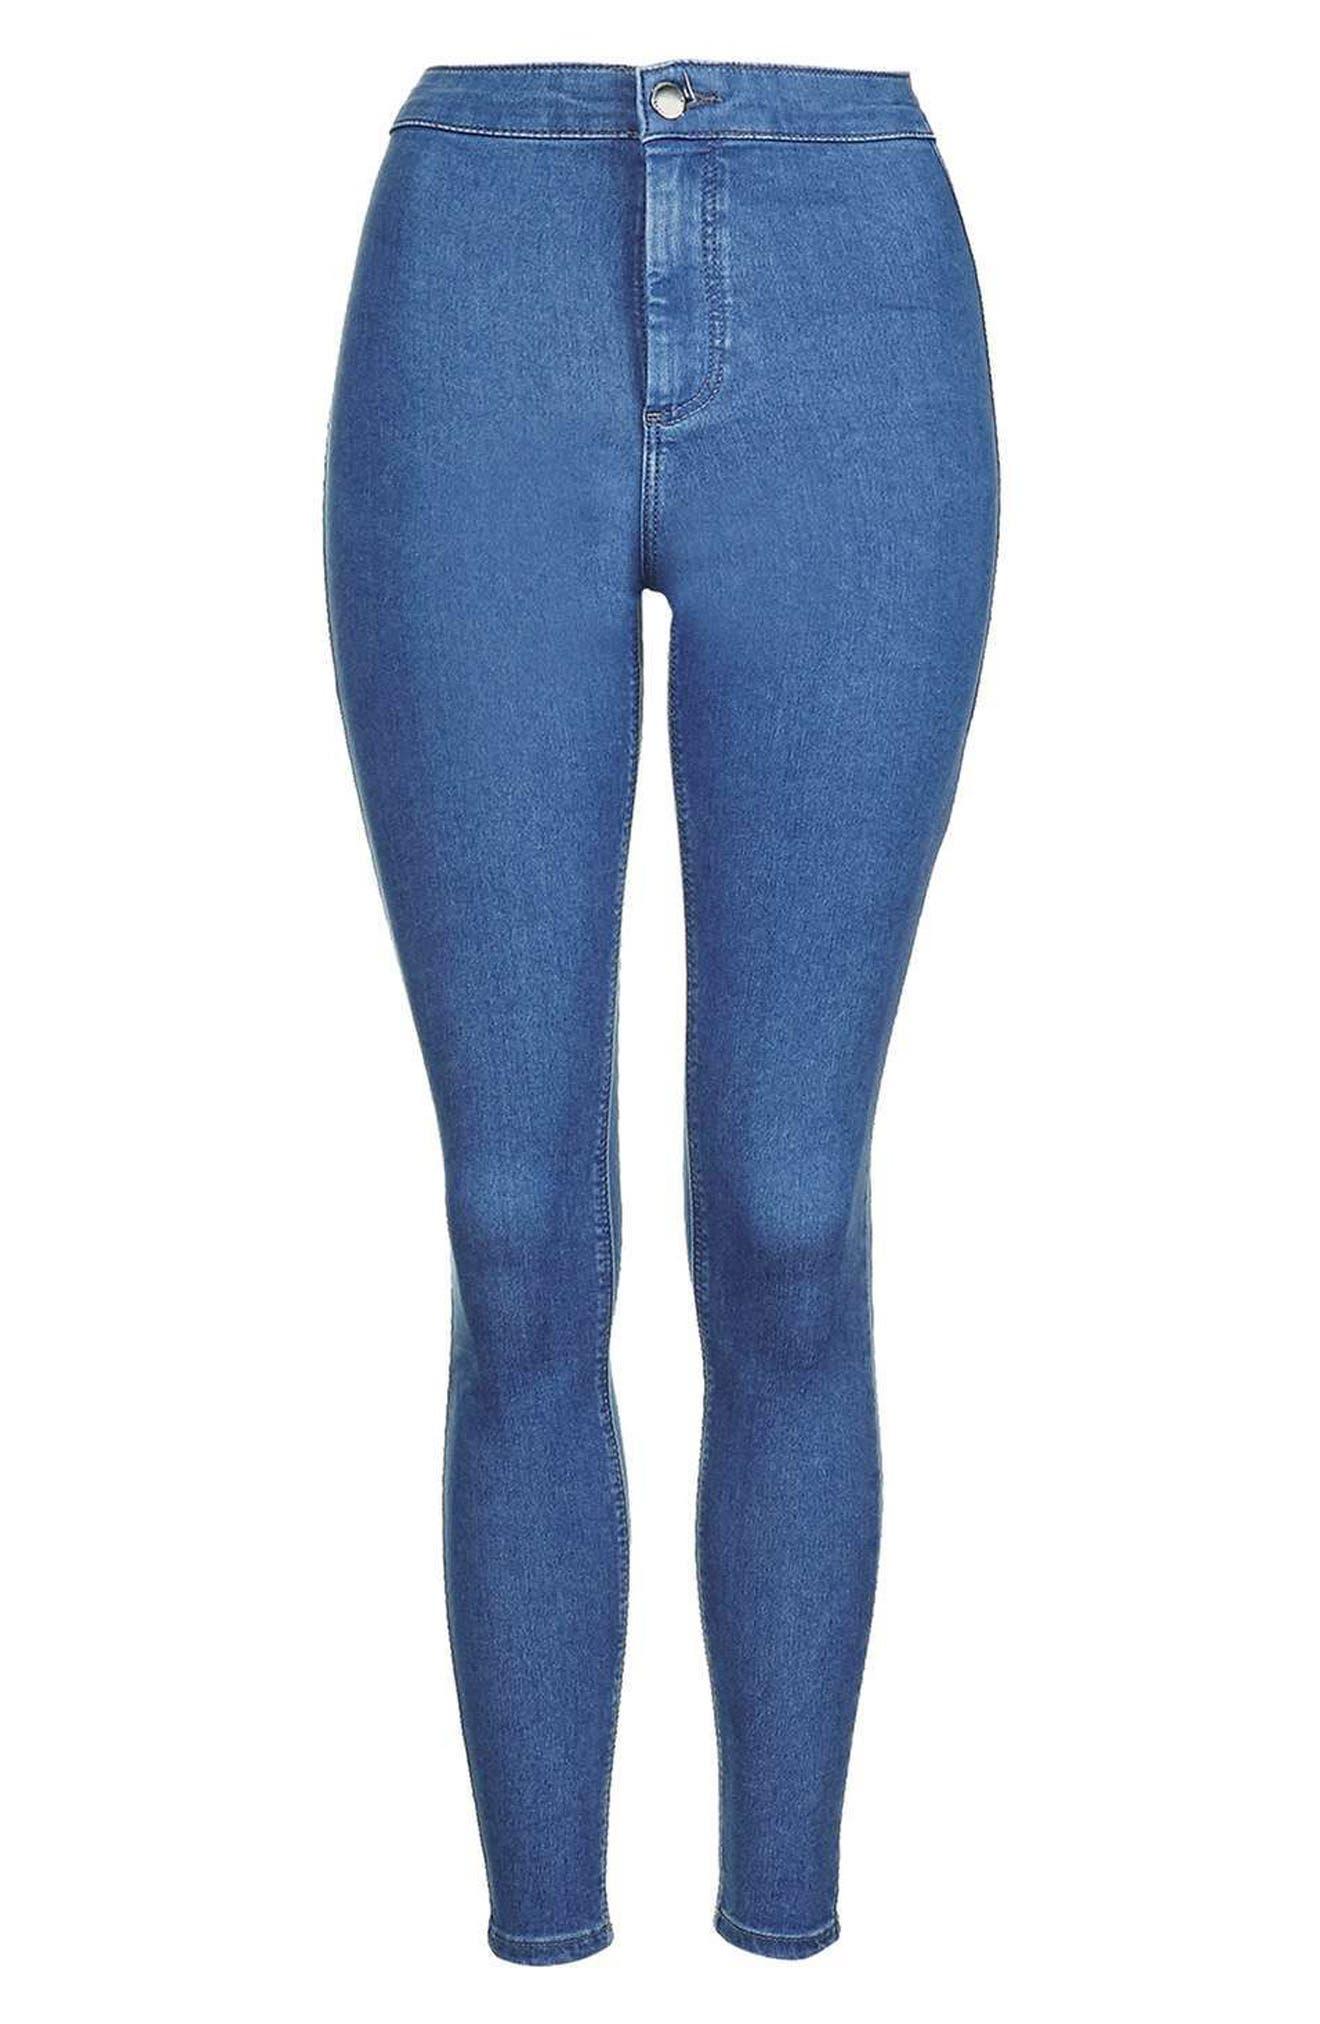 Alternate Image 4  - Topshop Joni Skinny Jeans (Tall)